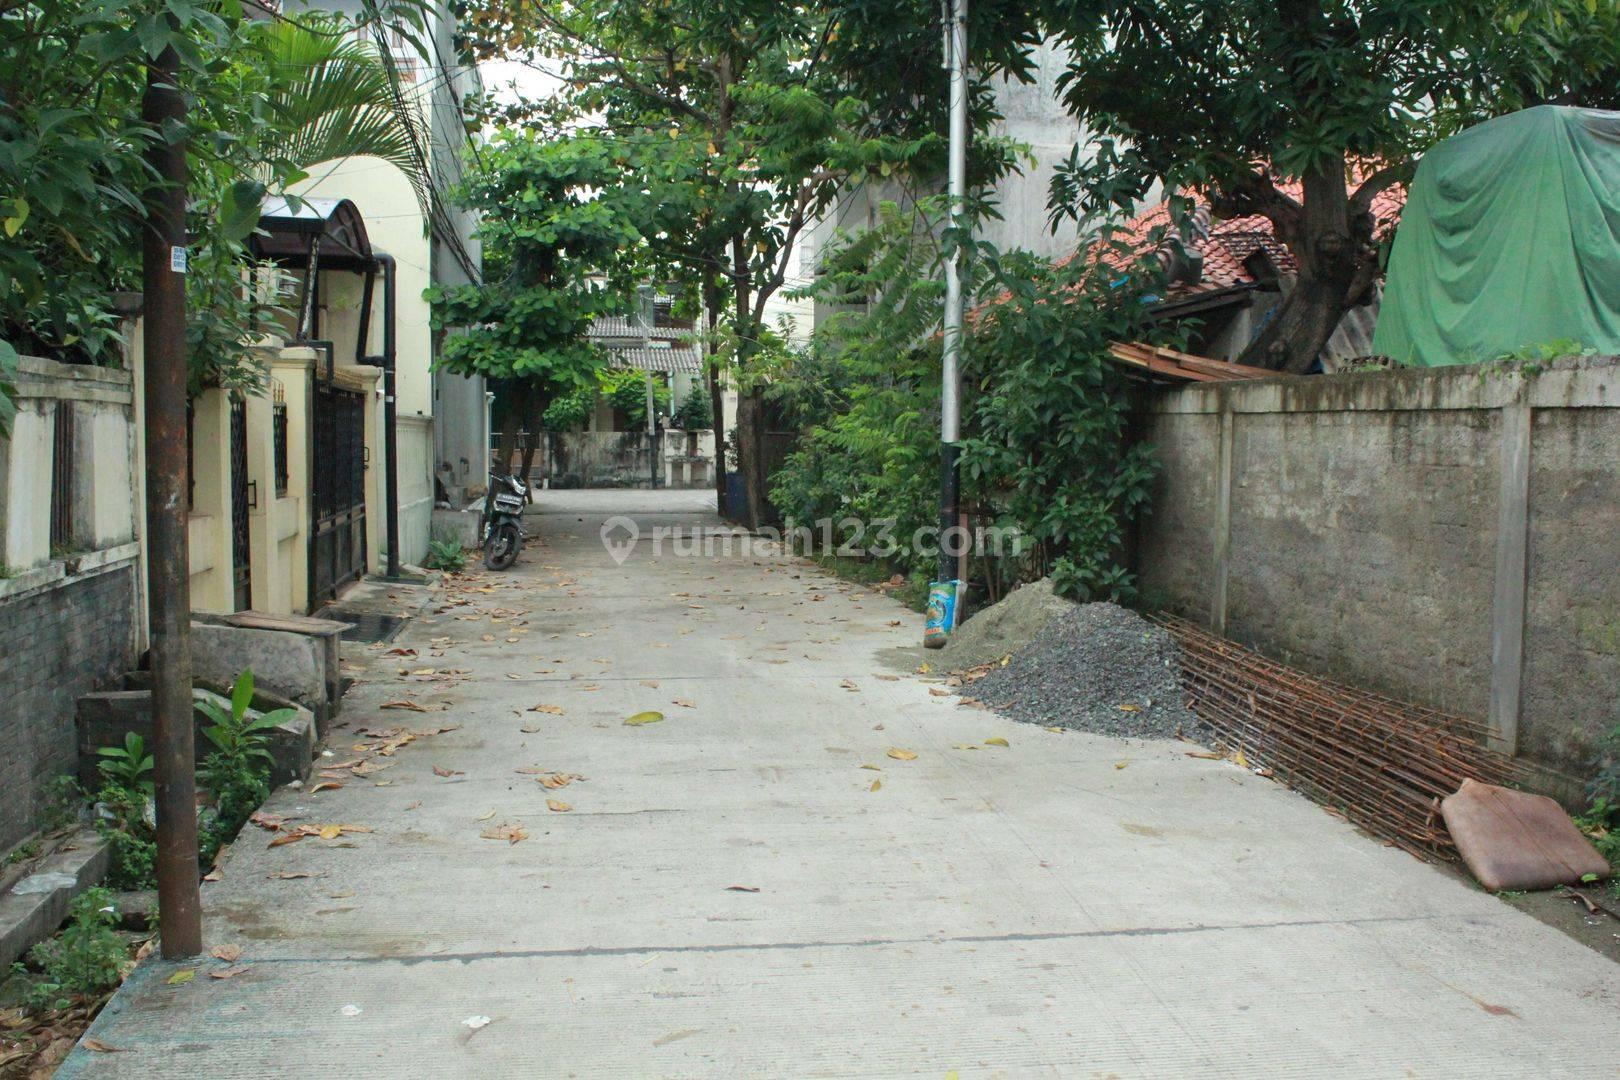 COCOK Untuk Kos-kos an, Investasi, di Pd Jaya, Mampang Prapatan